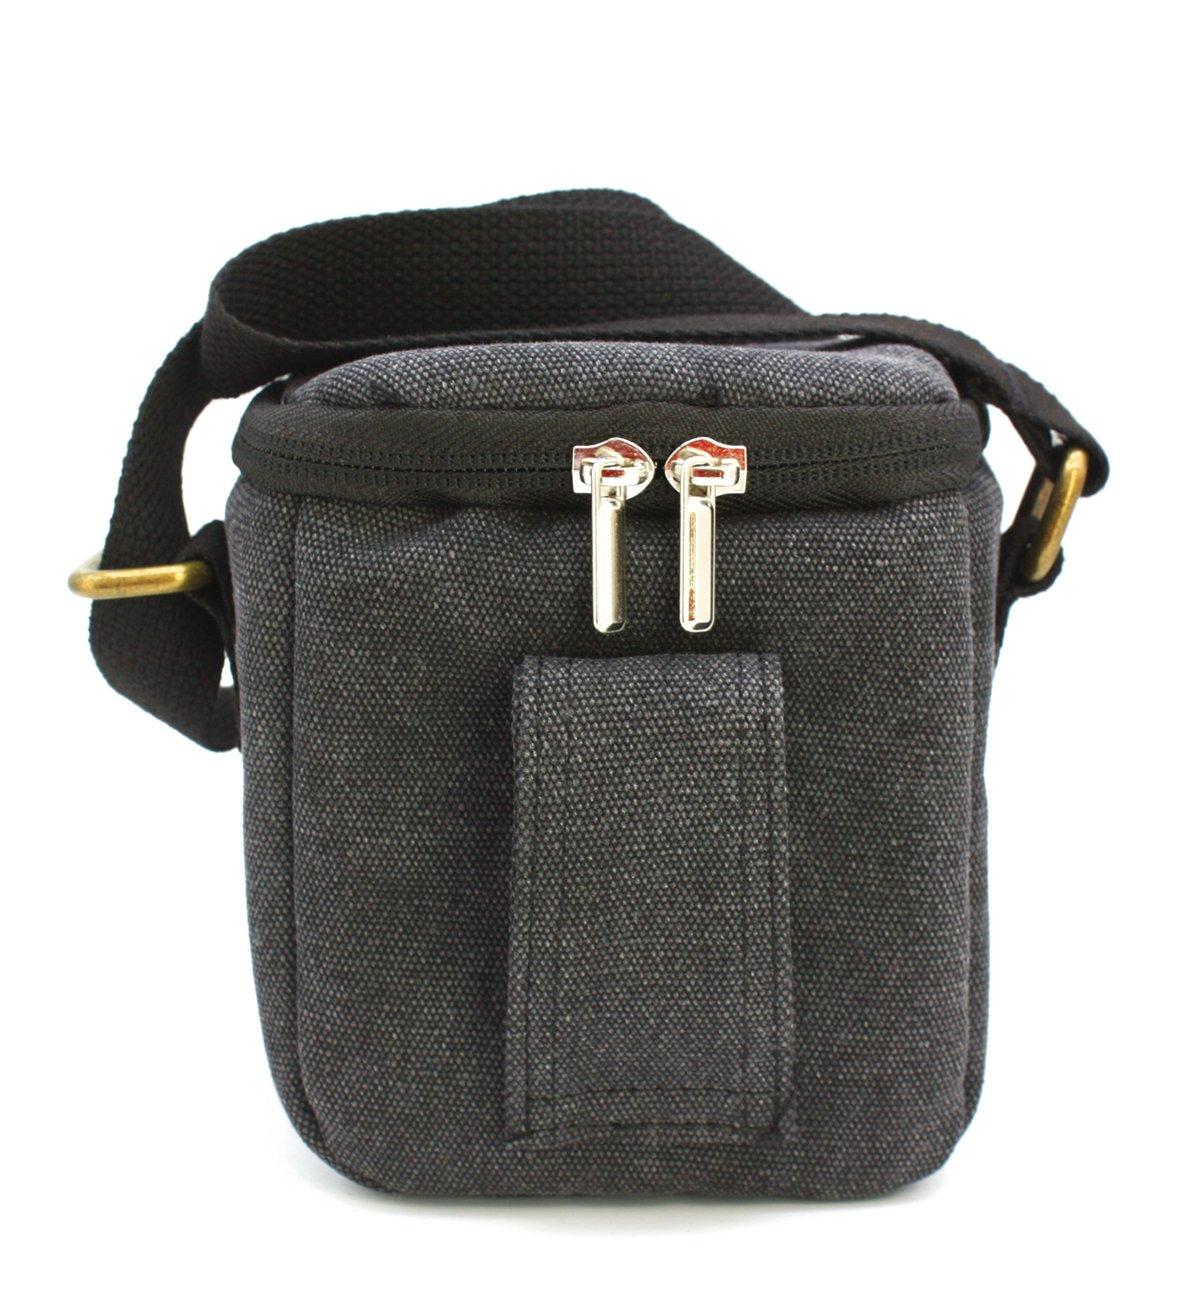 zdMoon Gray Camera case bag Canvas for Sony A5000 A5100 A6000 NEX-5T 5R NEX-7 NEX-6